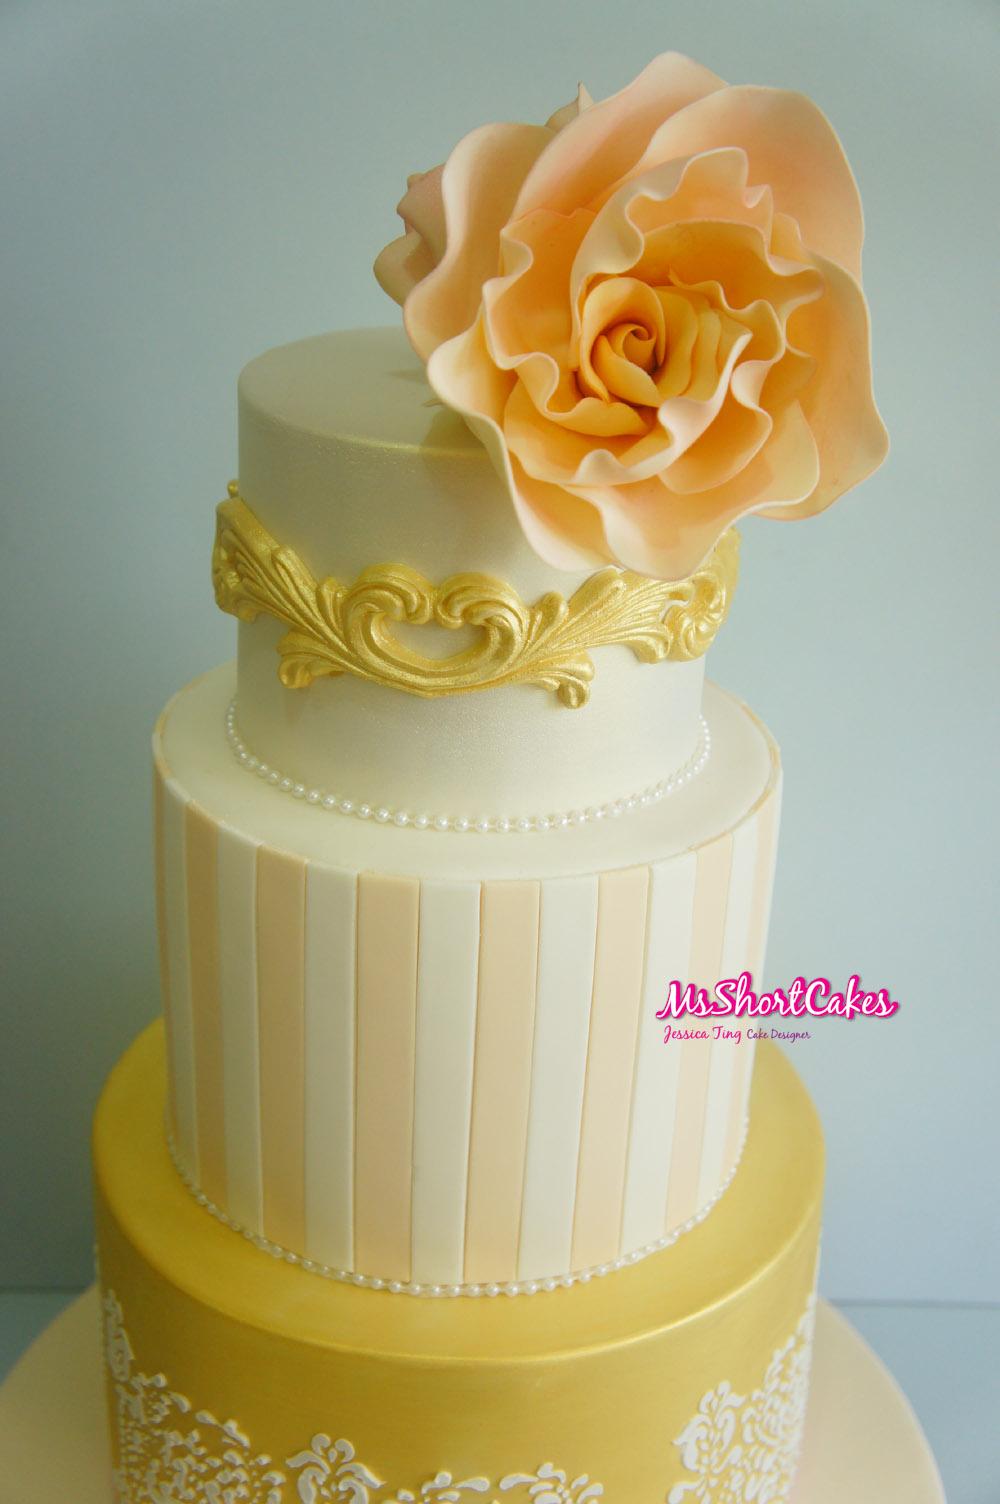 miss shortcakes royal wedding cakes